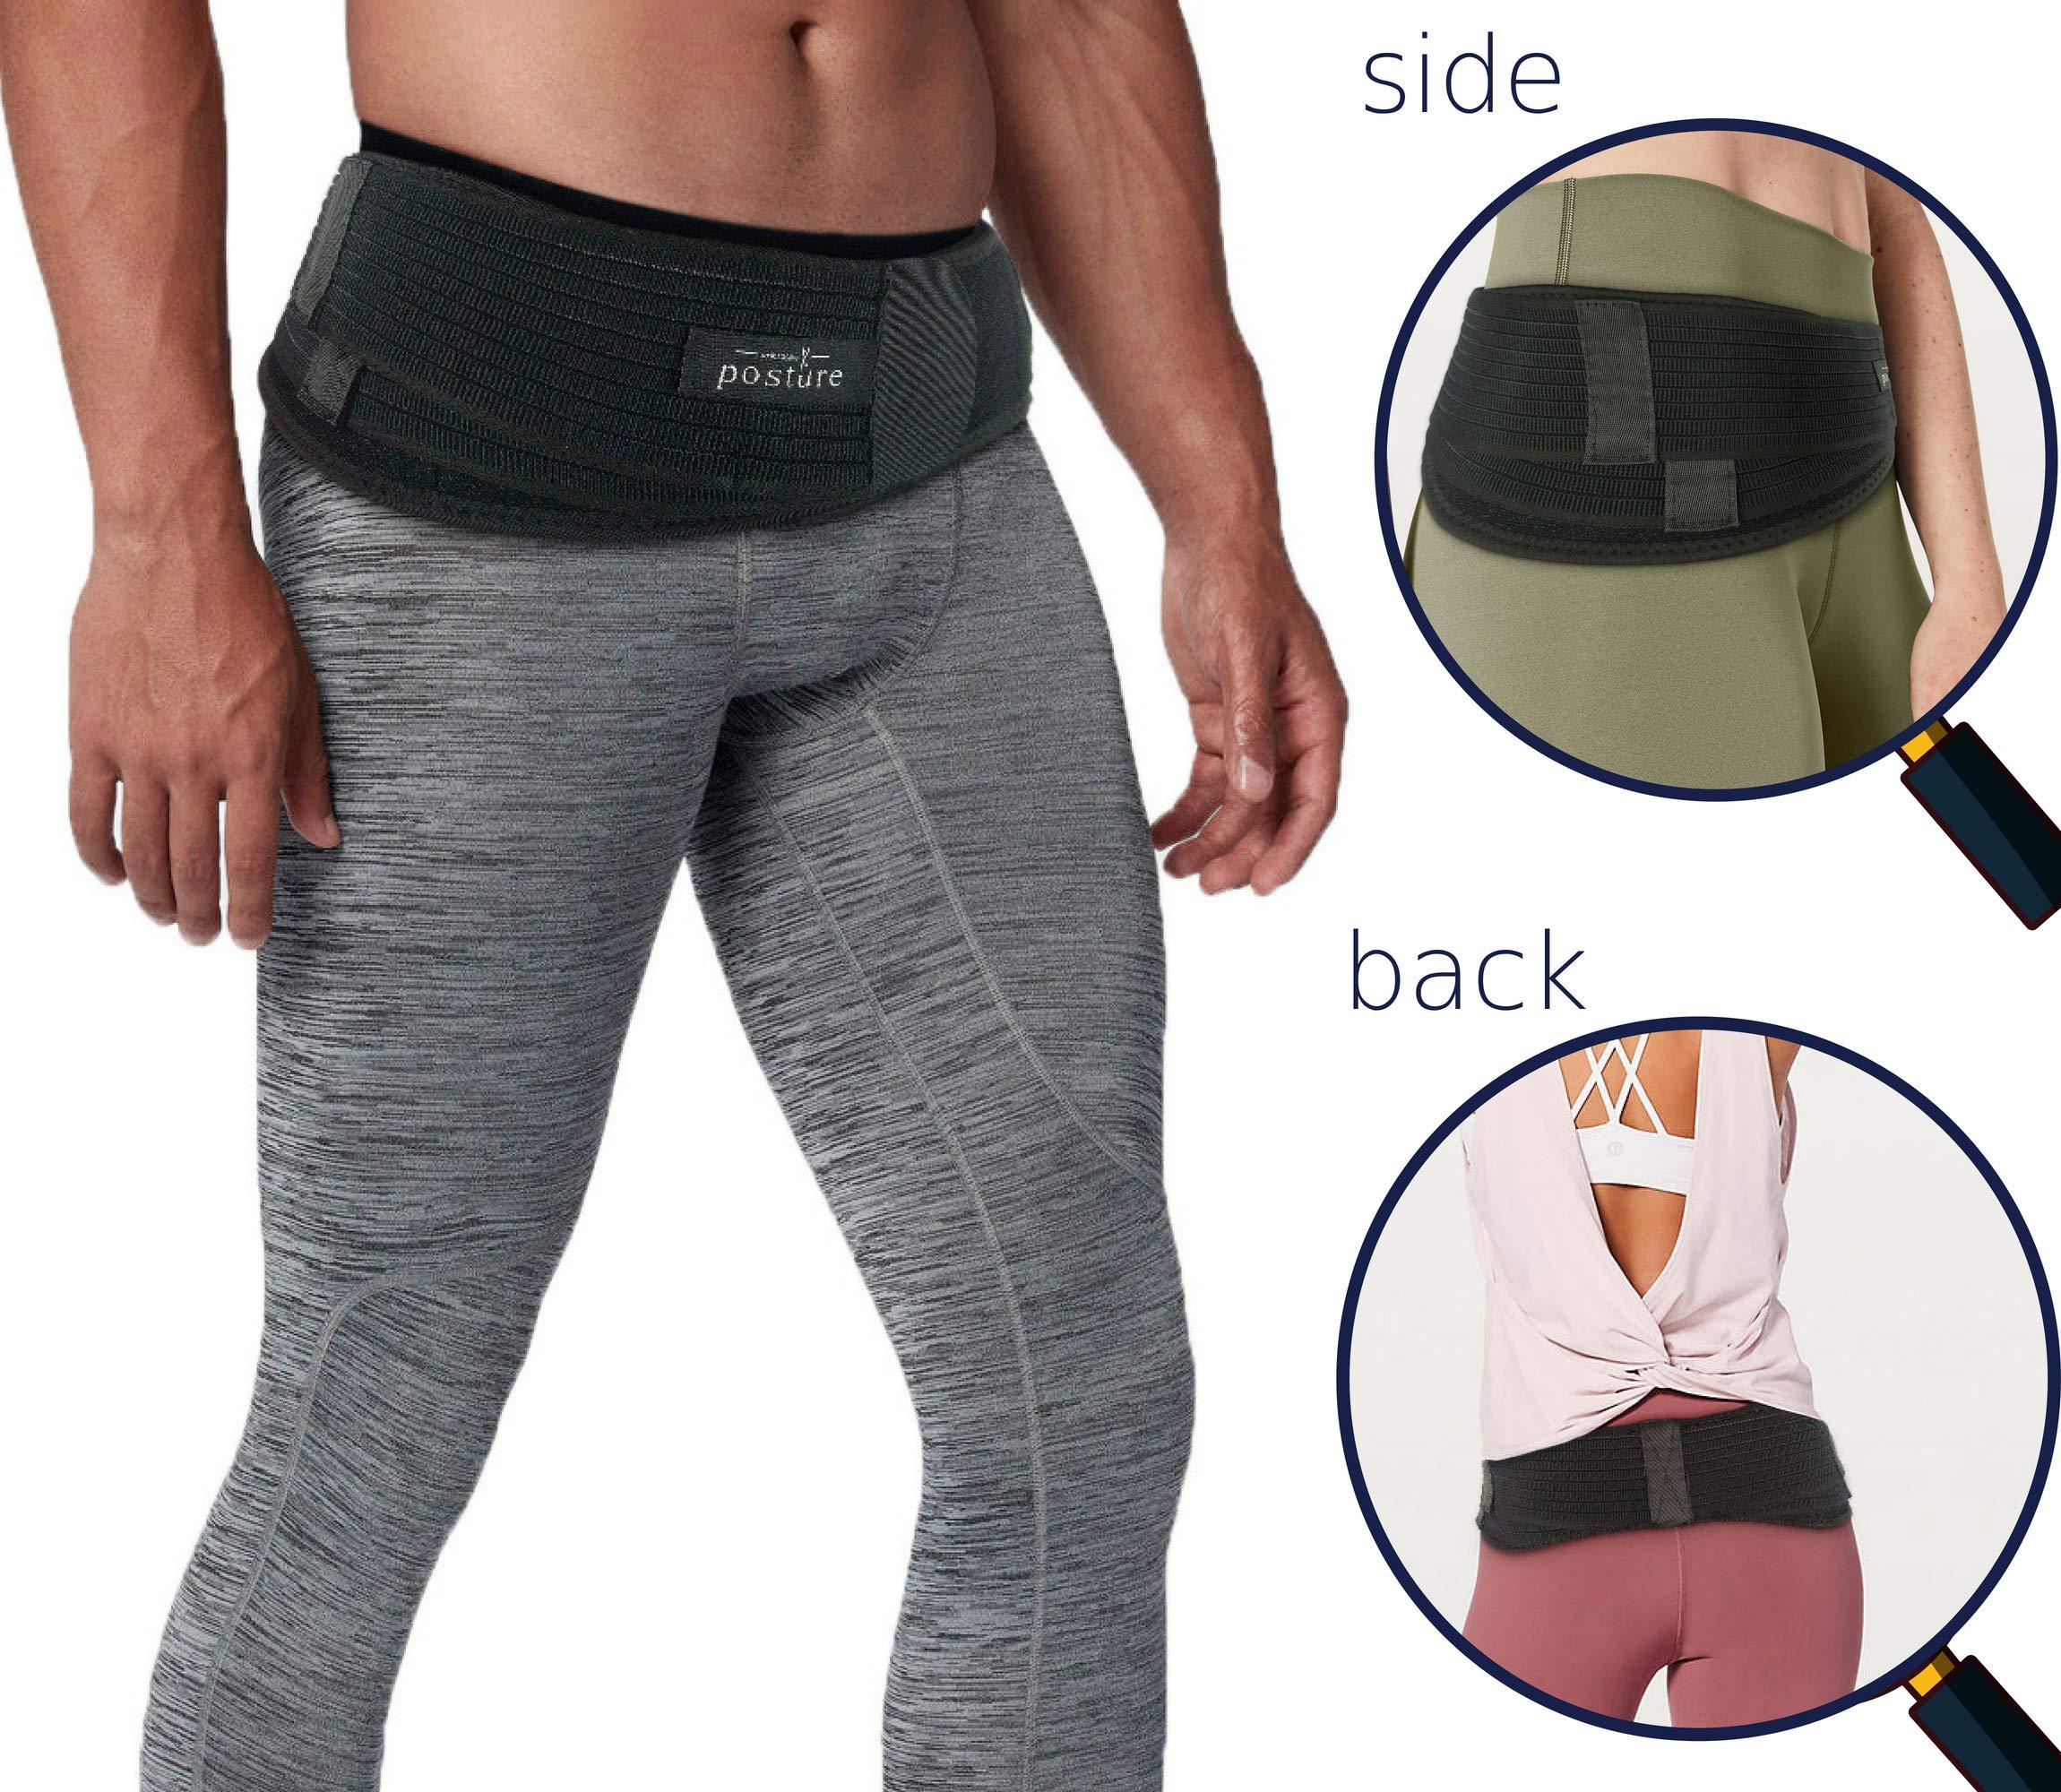 Vriksasana Si Belt for Men and Women That Treat Sciatica, Including Pelvic, Back and Leg Pain Nerve Pain, Stabilize Sacroiliac Joint | Trochanter Brace | Anti-Slip and Pilling-Resistant (REGULAR SIZE)